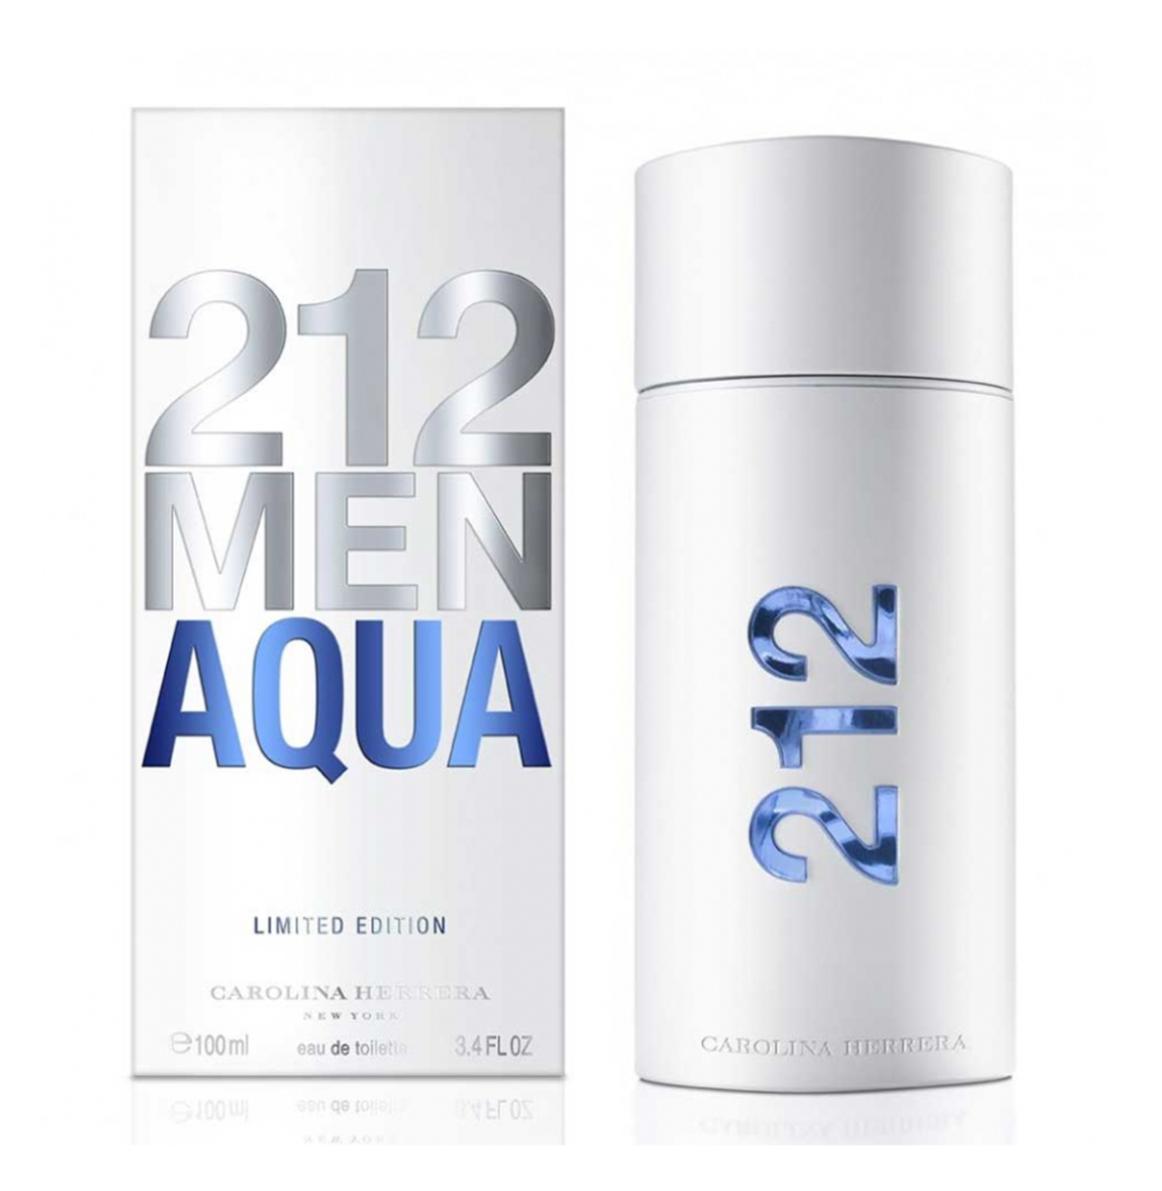 289e5e7d44794 Carolina Herrera - 212 Men Aqua - Eau de Toilette para homem ...